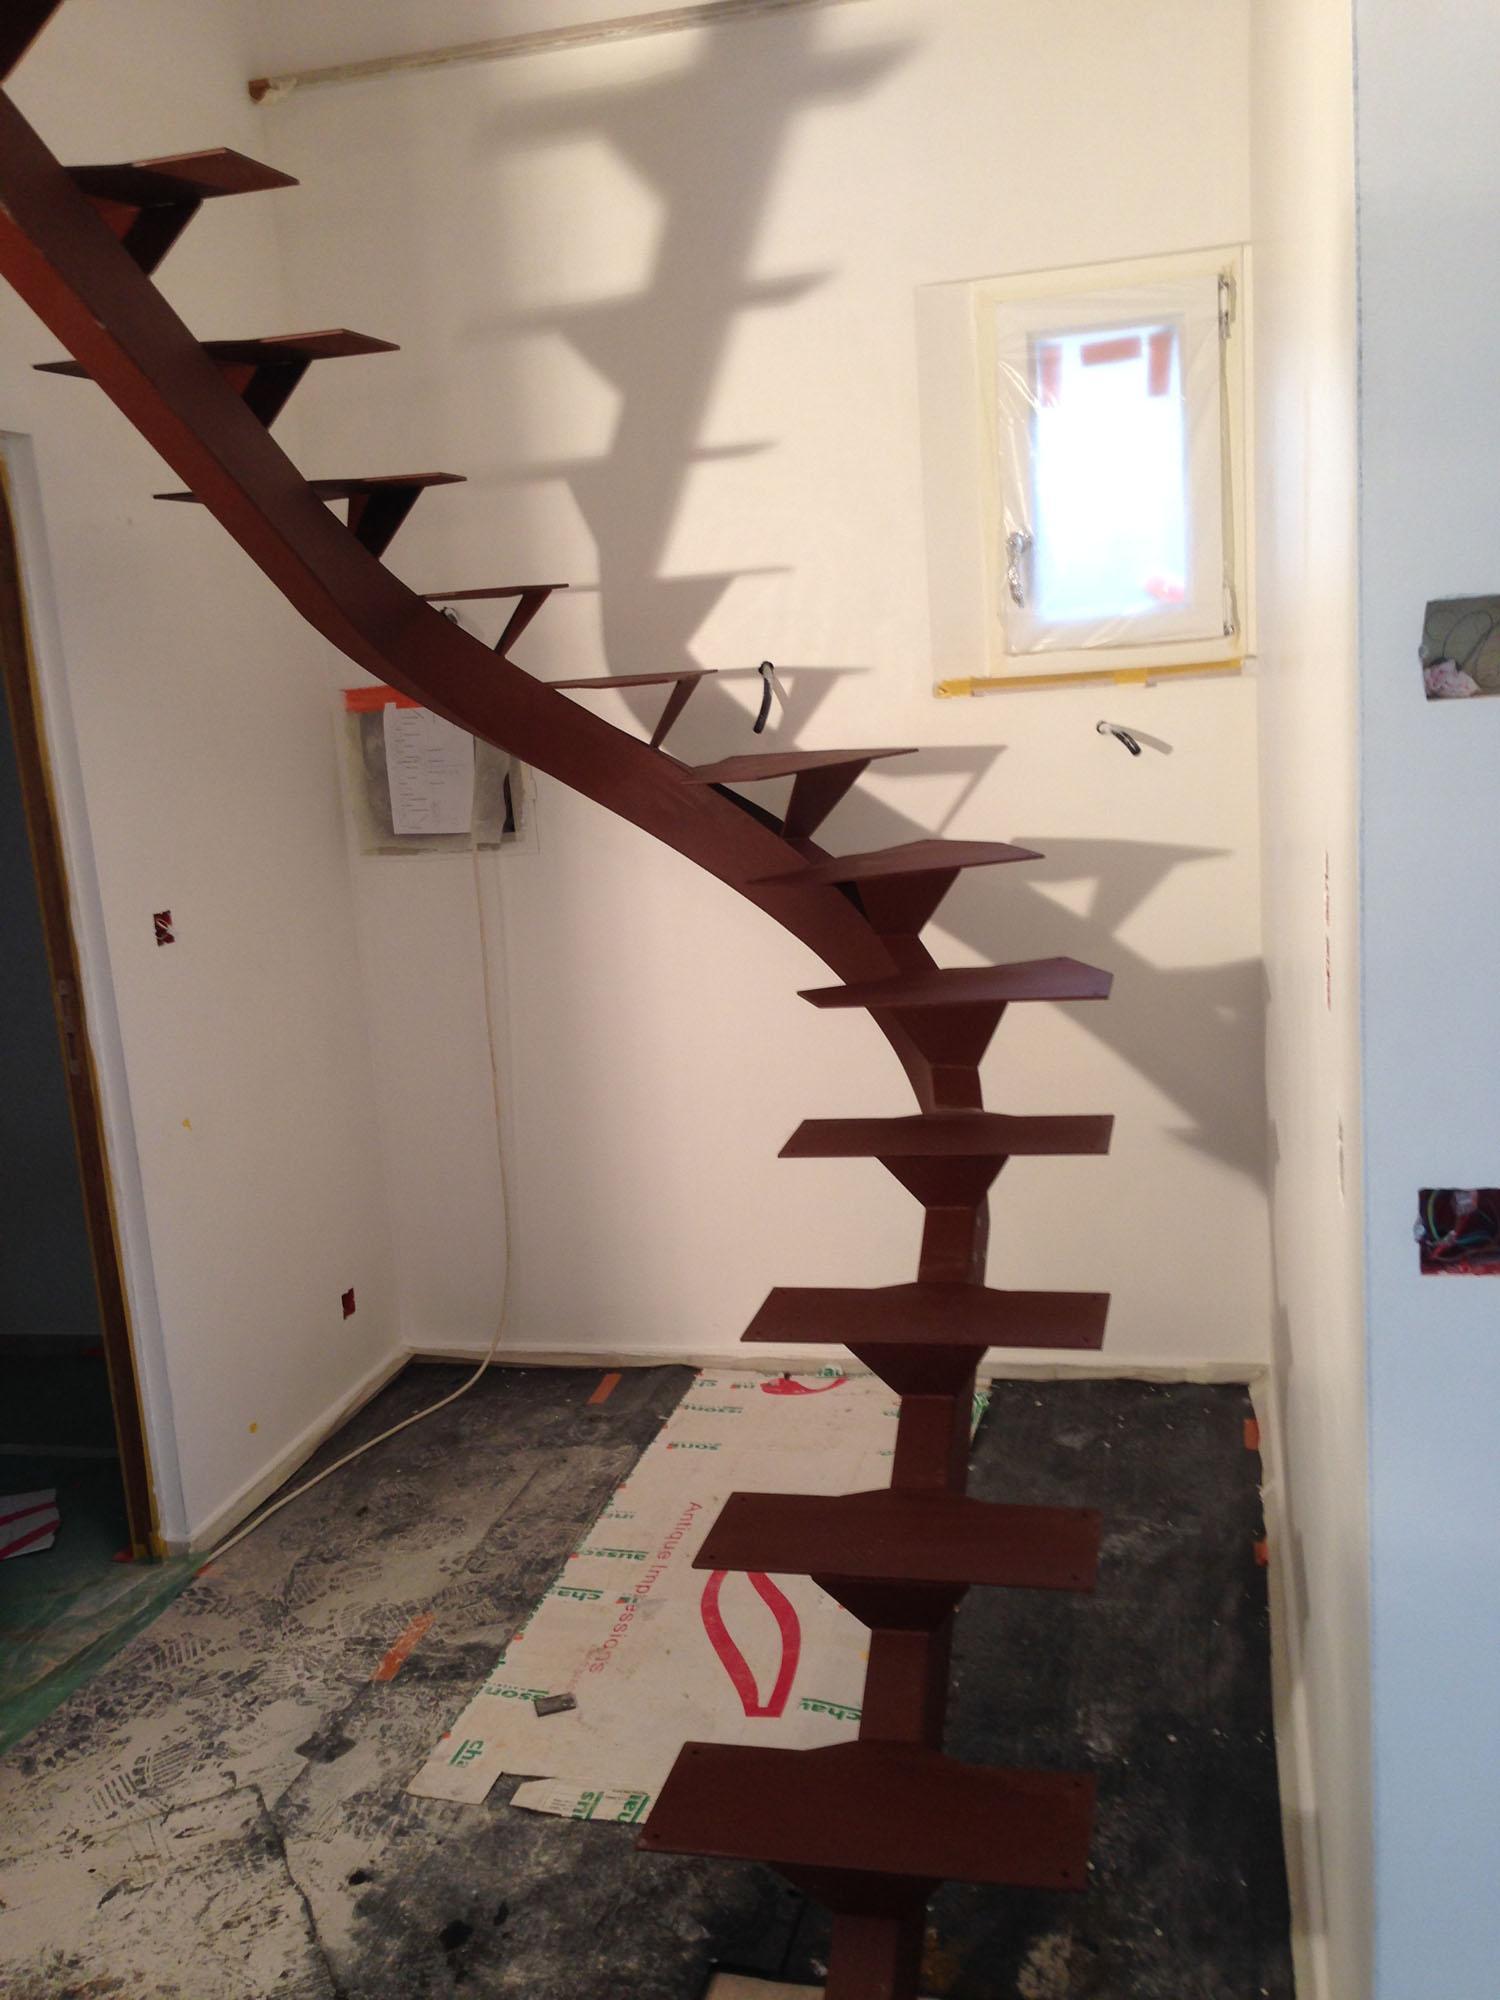 Escalier stucture métallique